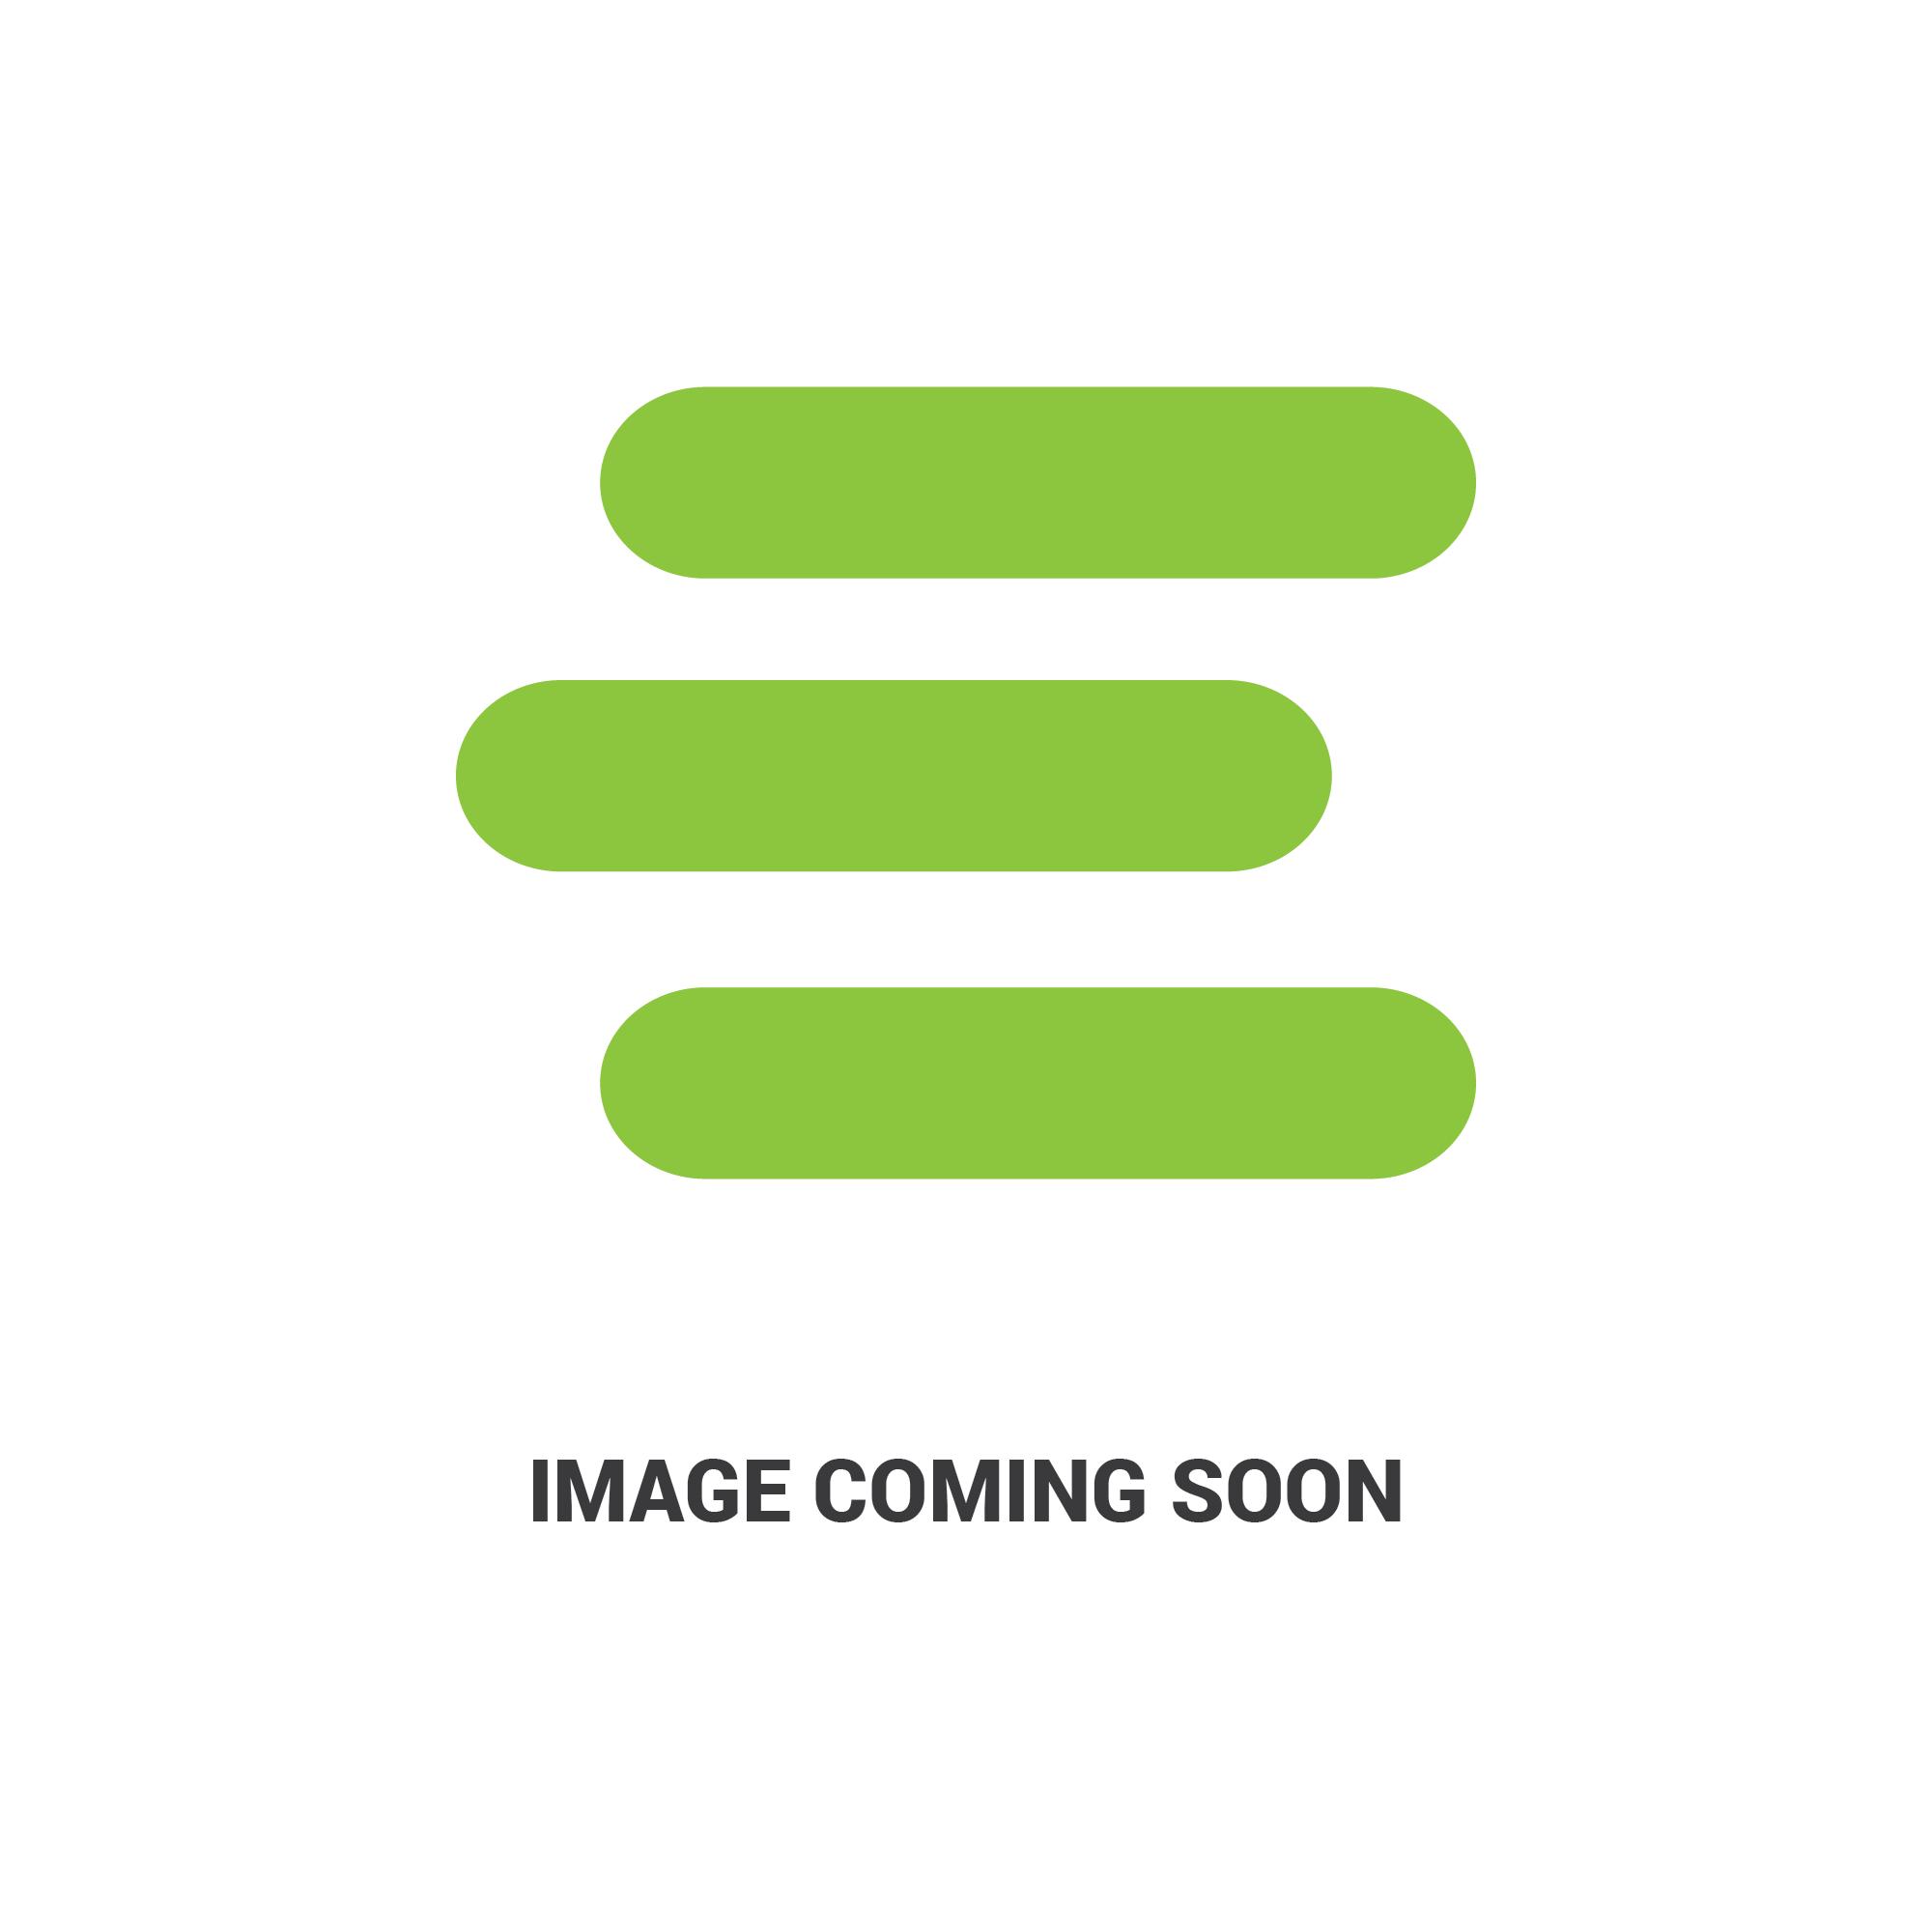 E-6726898edit 1.jpg